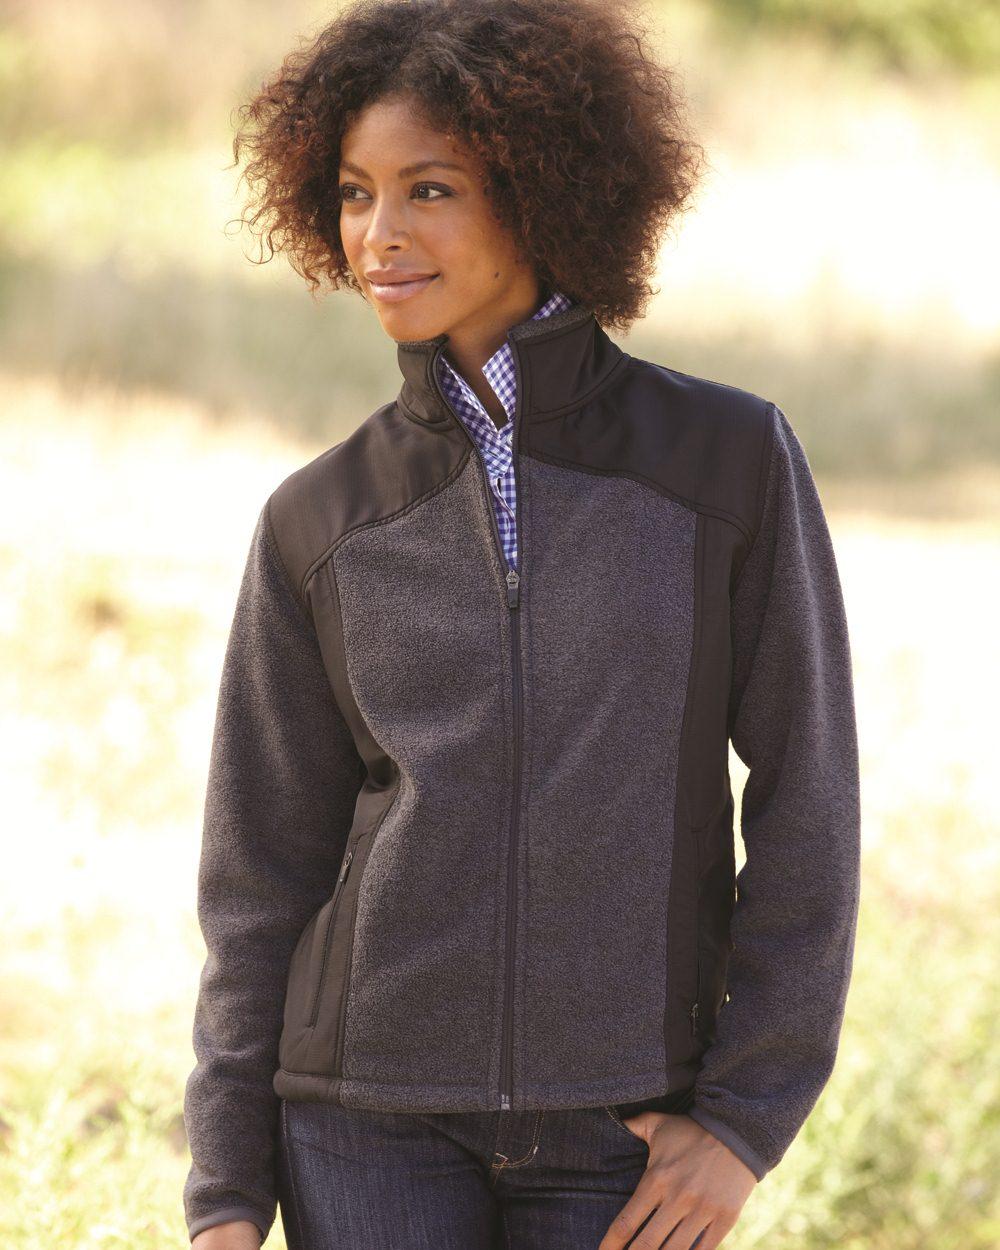 Colorado Clothing 7116 - Ladies' Telluride Nylon/Polarfleece Jacket